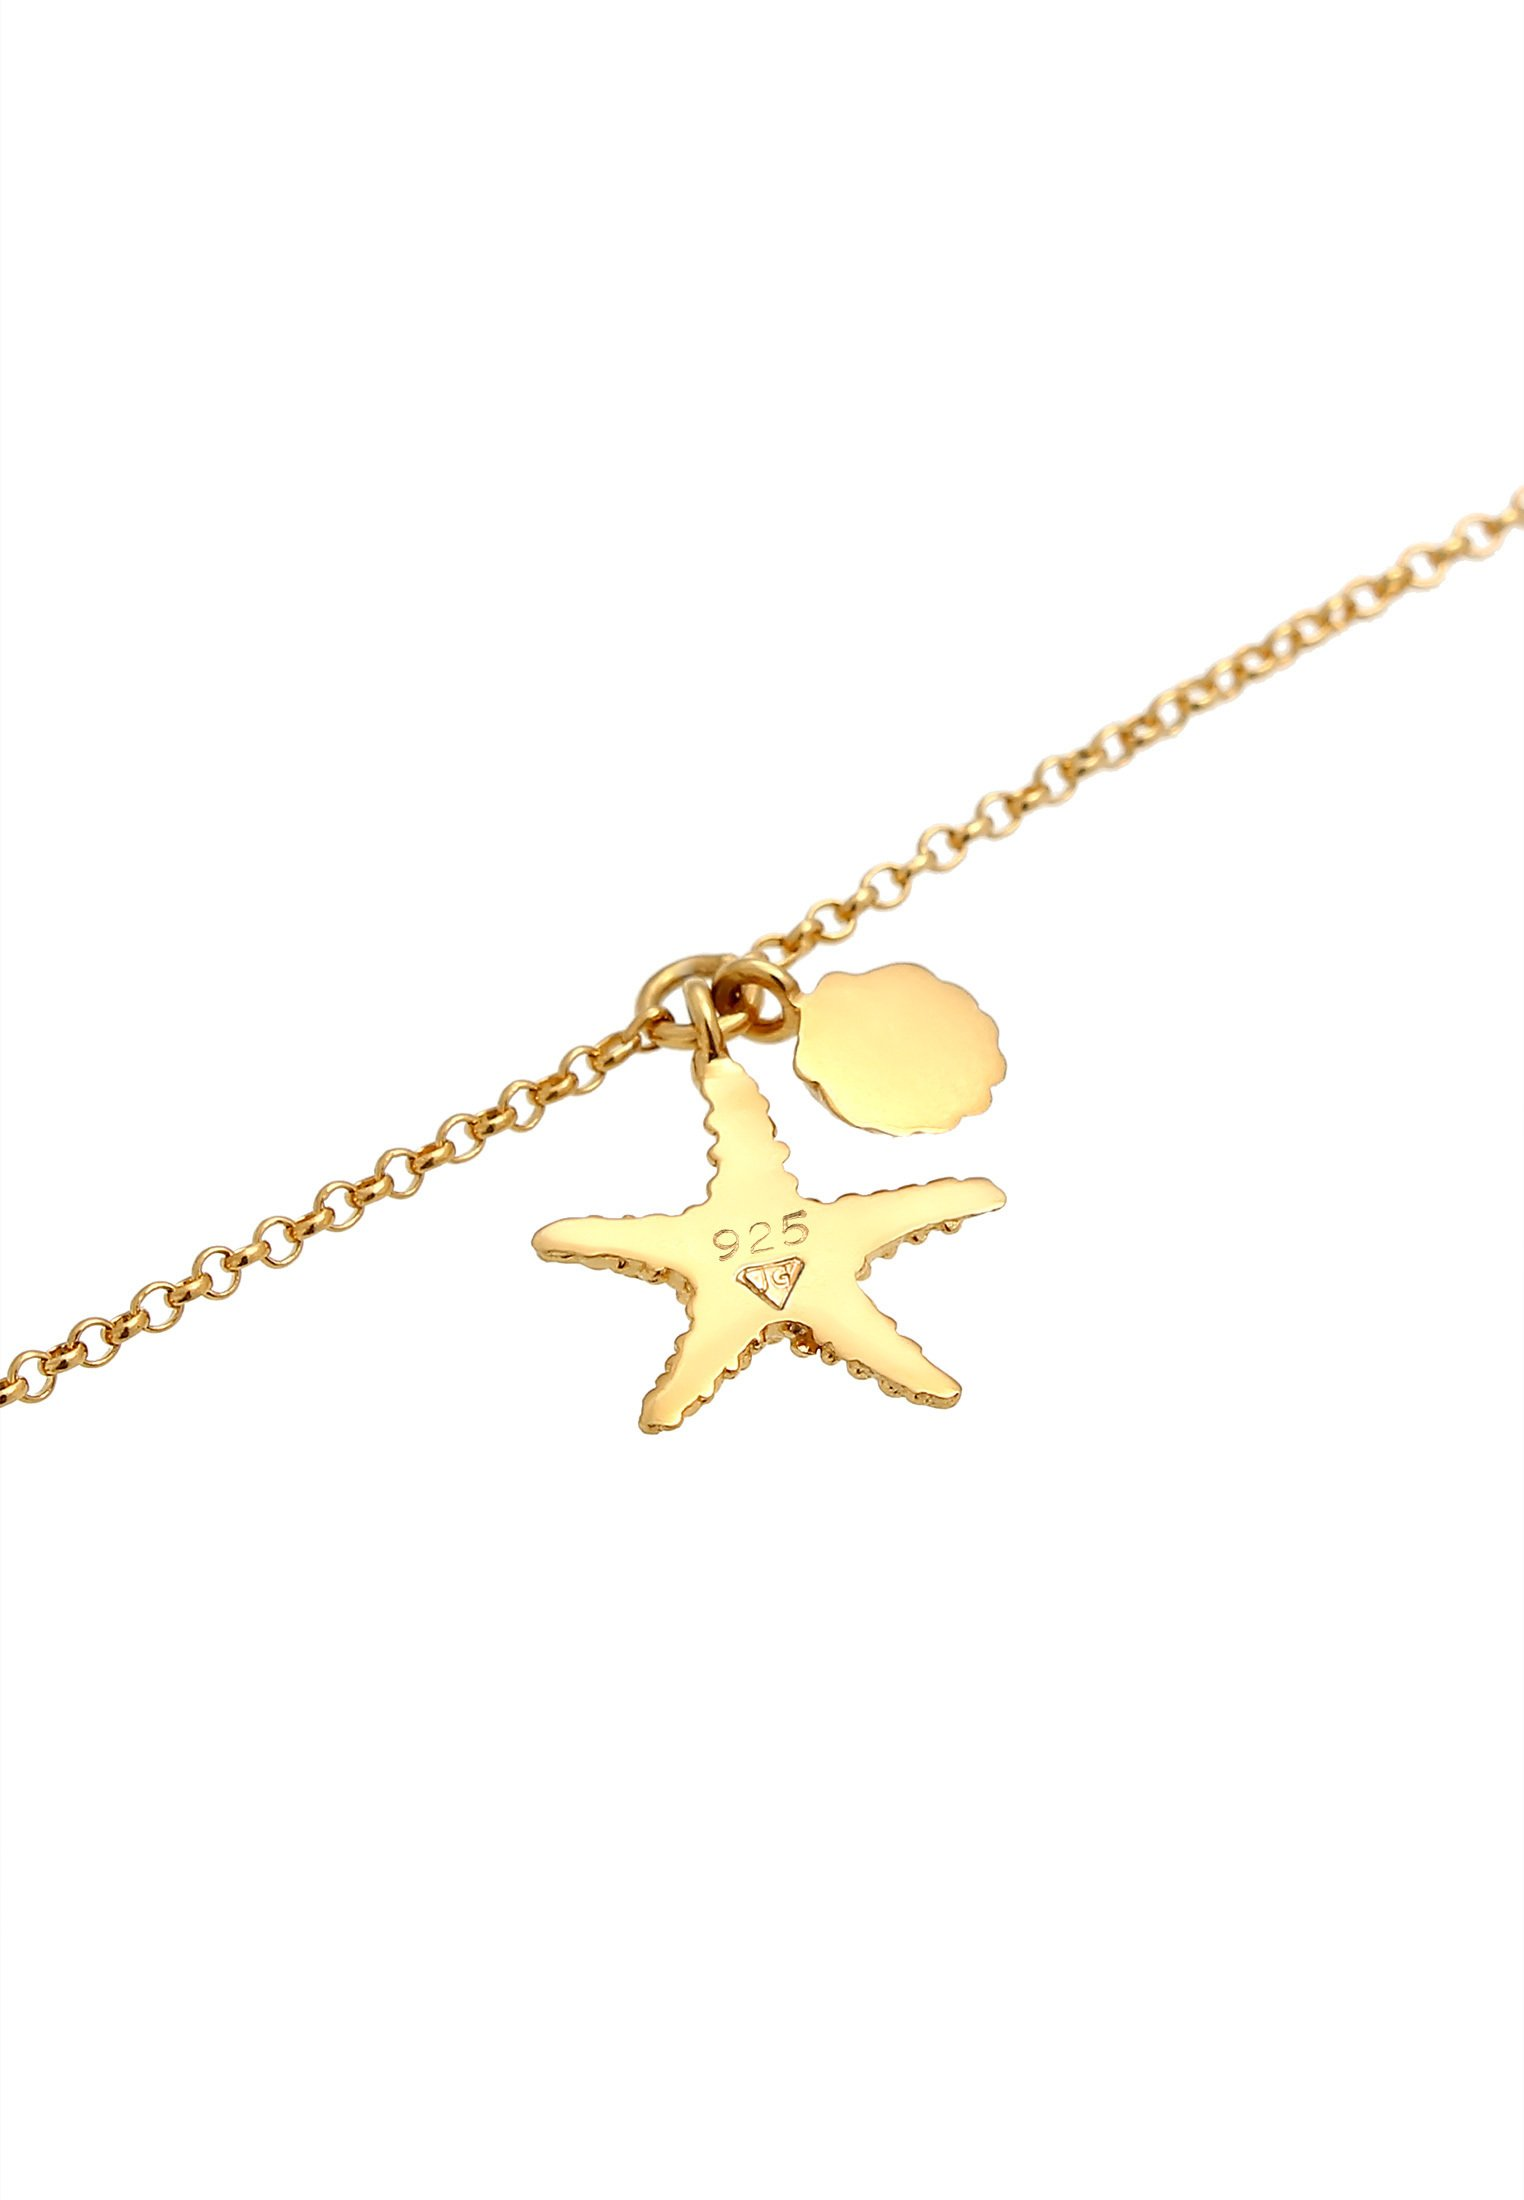 Elli SEESTERN MUSCHEL MEER MARITIM - Armband - gold-coloured/gold - Herrenaccessoires LHOfa